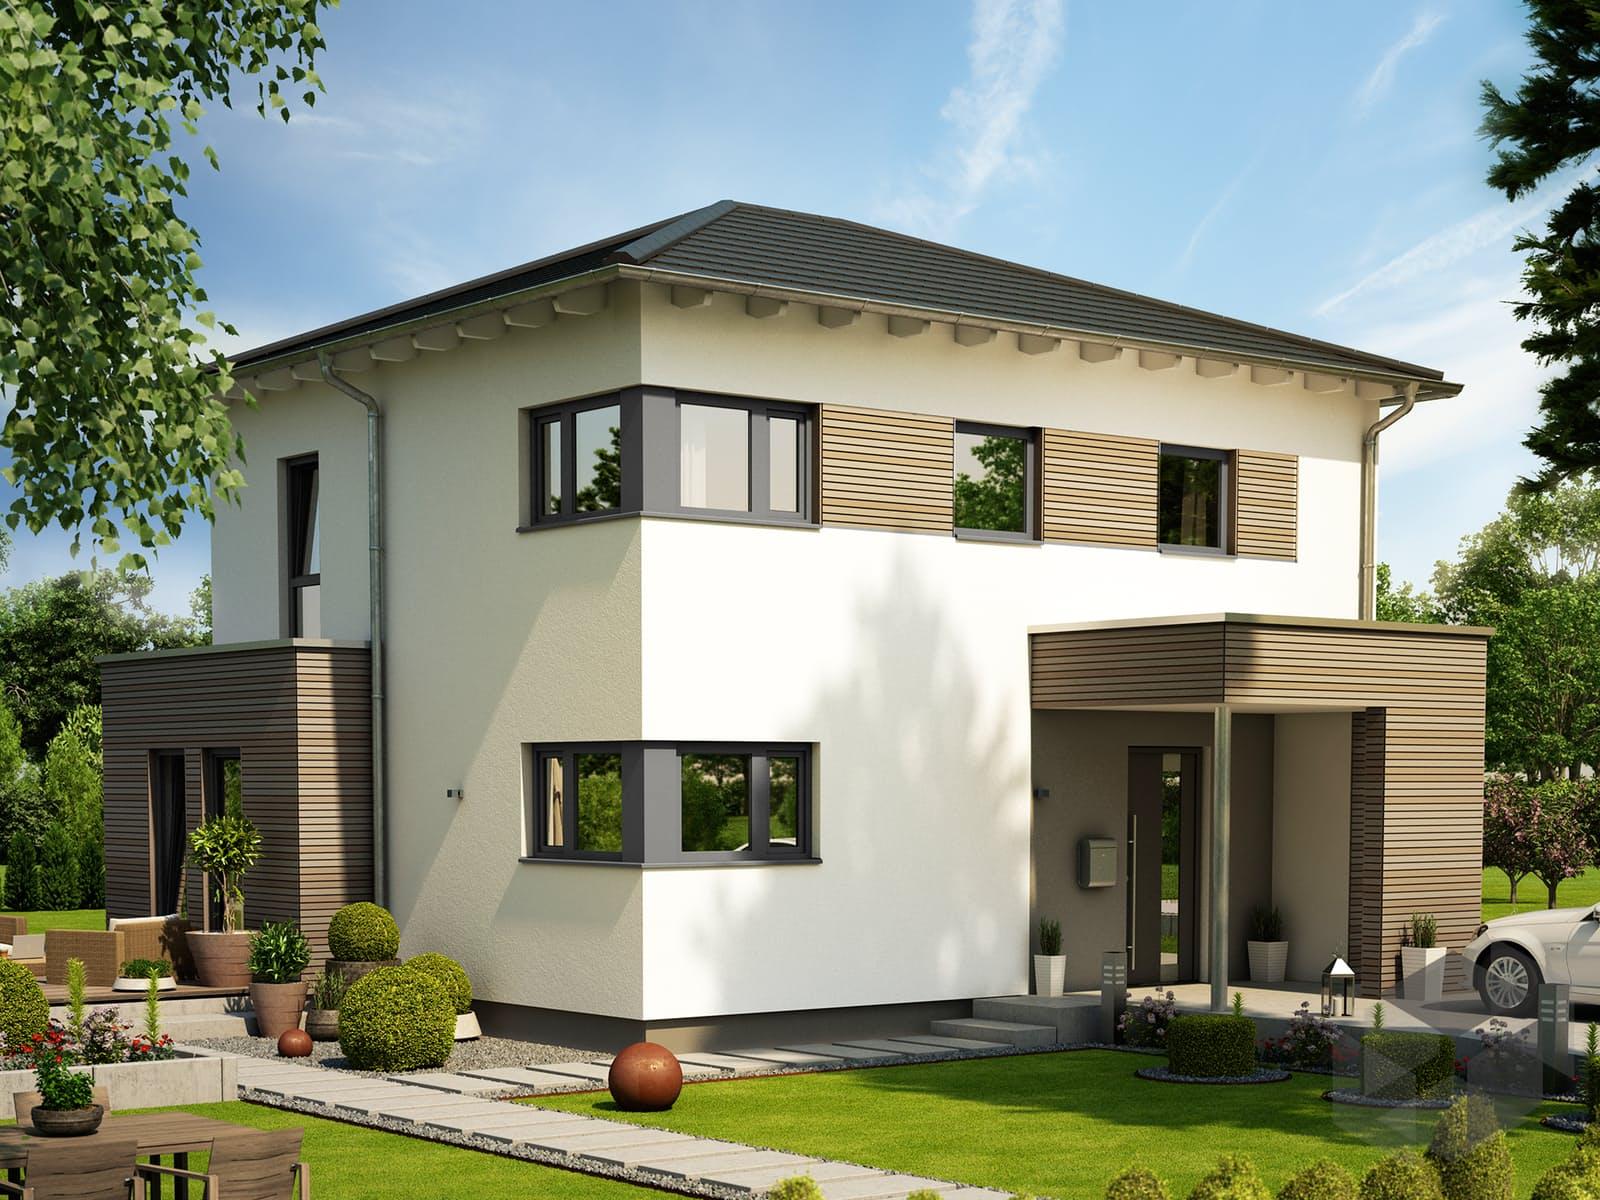 sunshine 125 v5 von living haus komplette daten bersicht. Black Bedroom Furniture Sets. Home Design Ideas